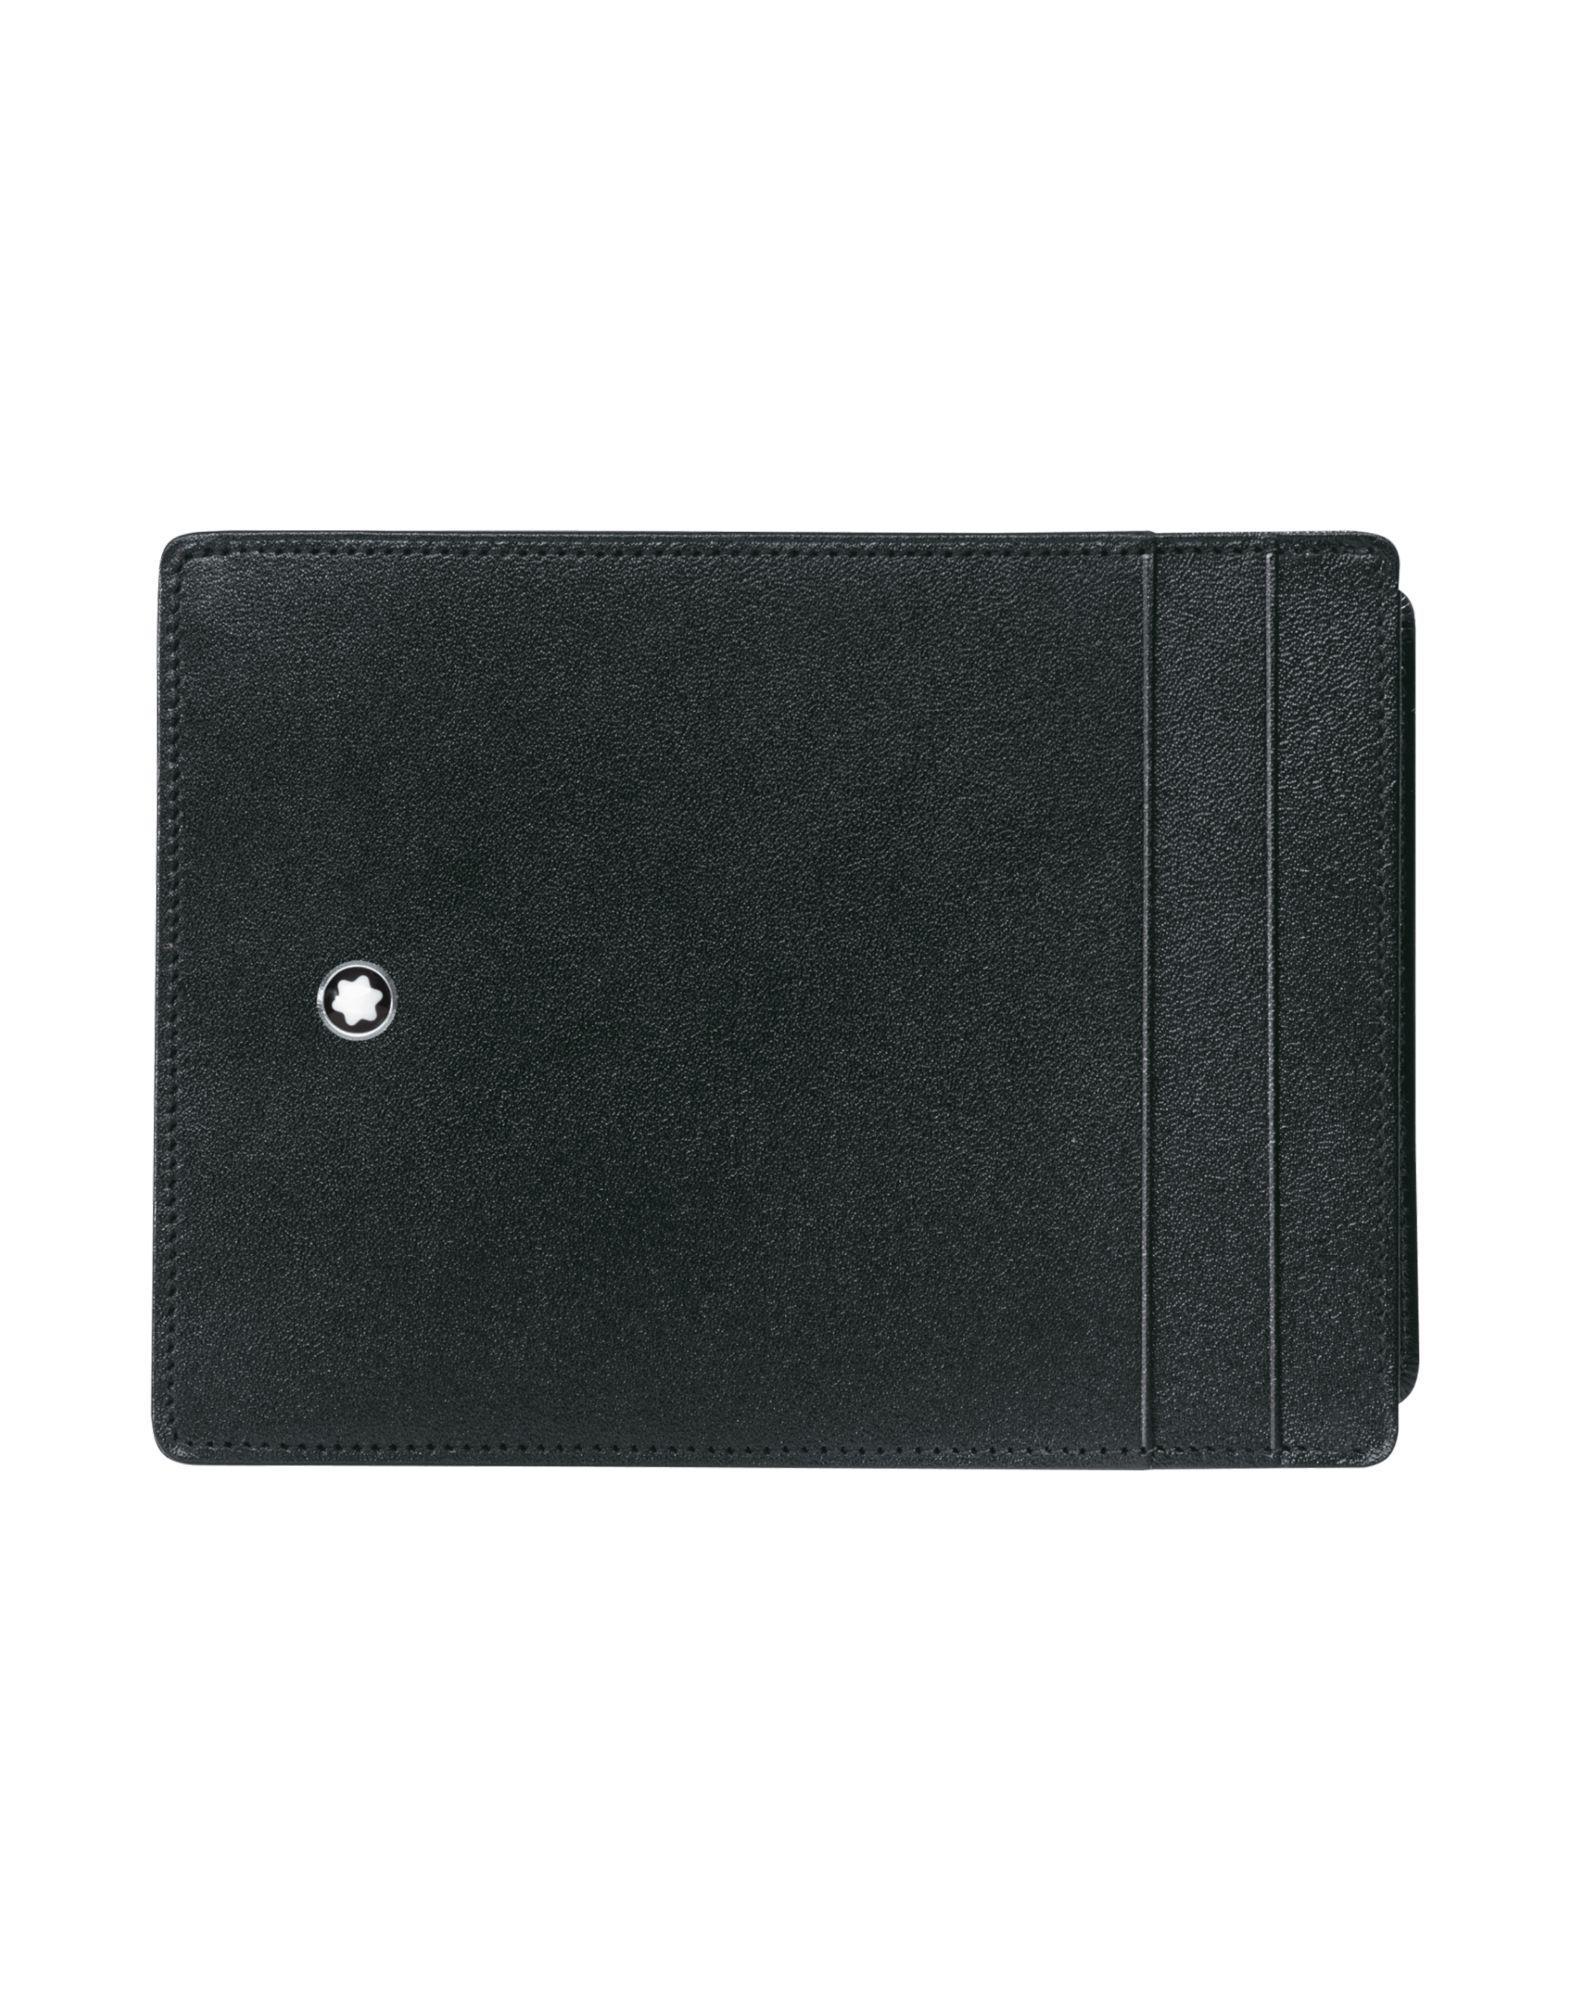 76525e6ae Montblanc - Black Billetera for Men - Lyst. Ver en pantalla completa